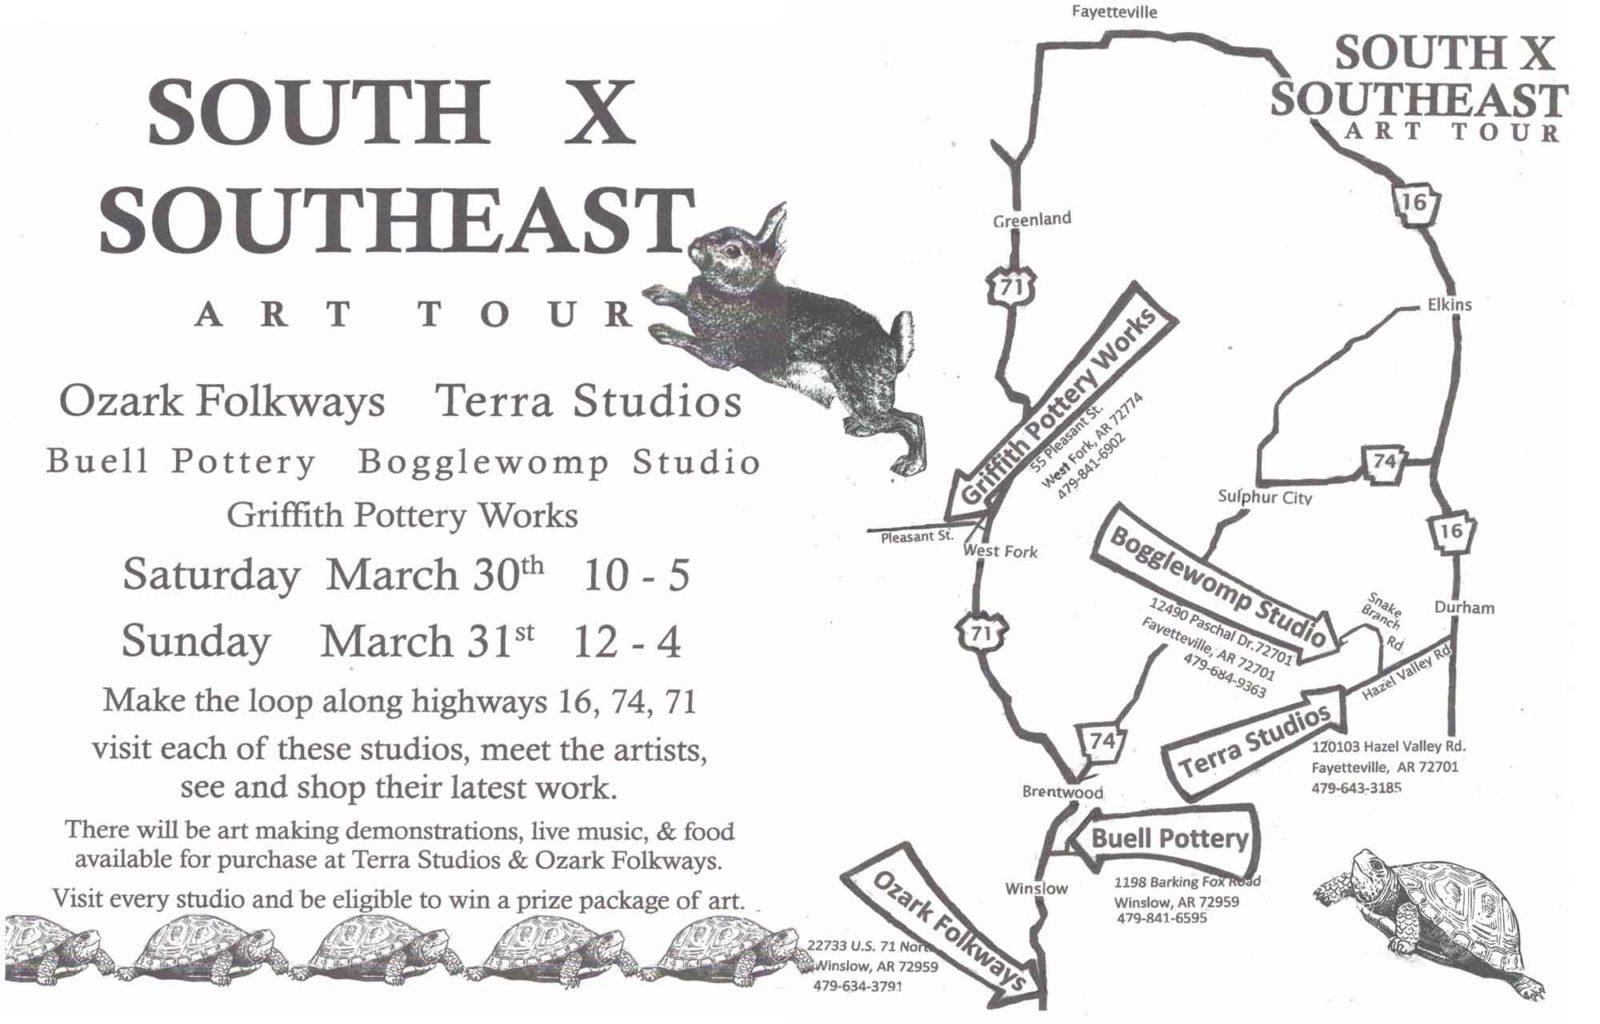 The tour route for South x Southeast Art Tour 2019